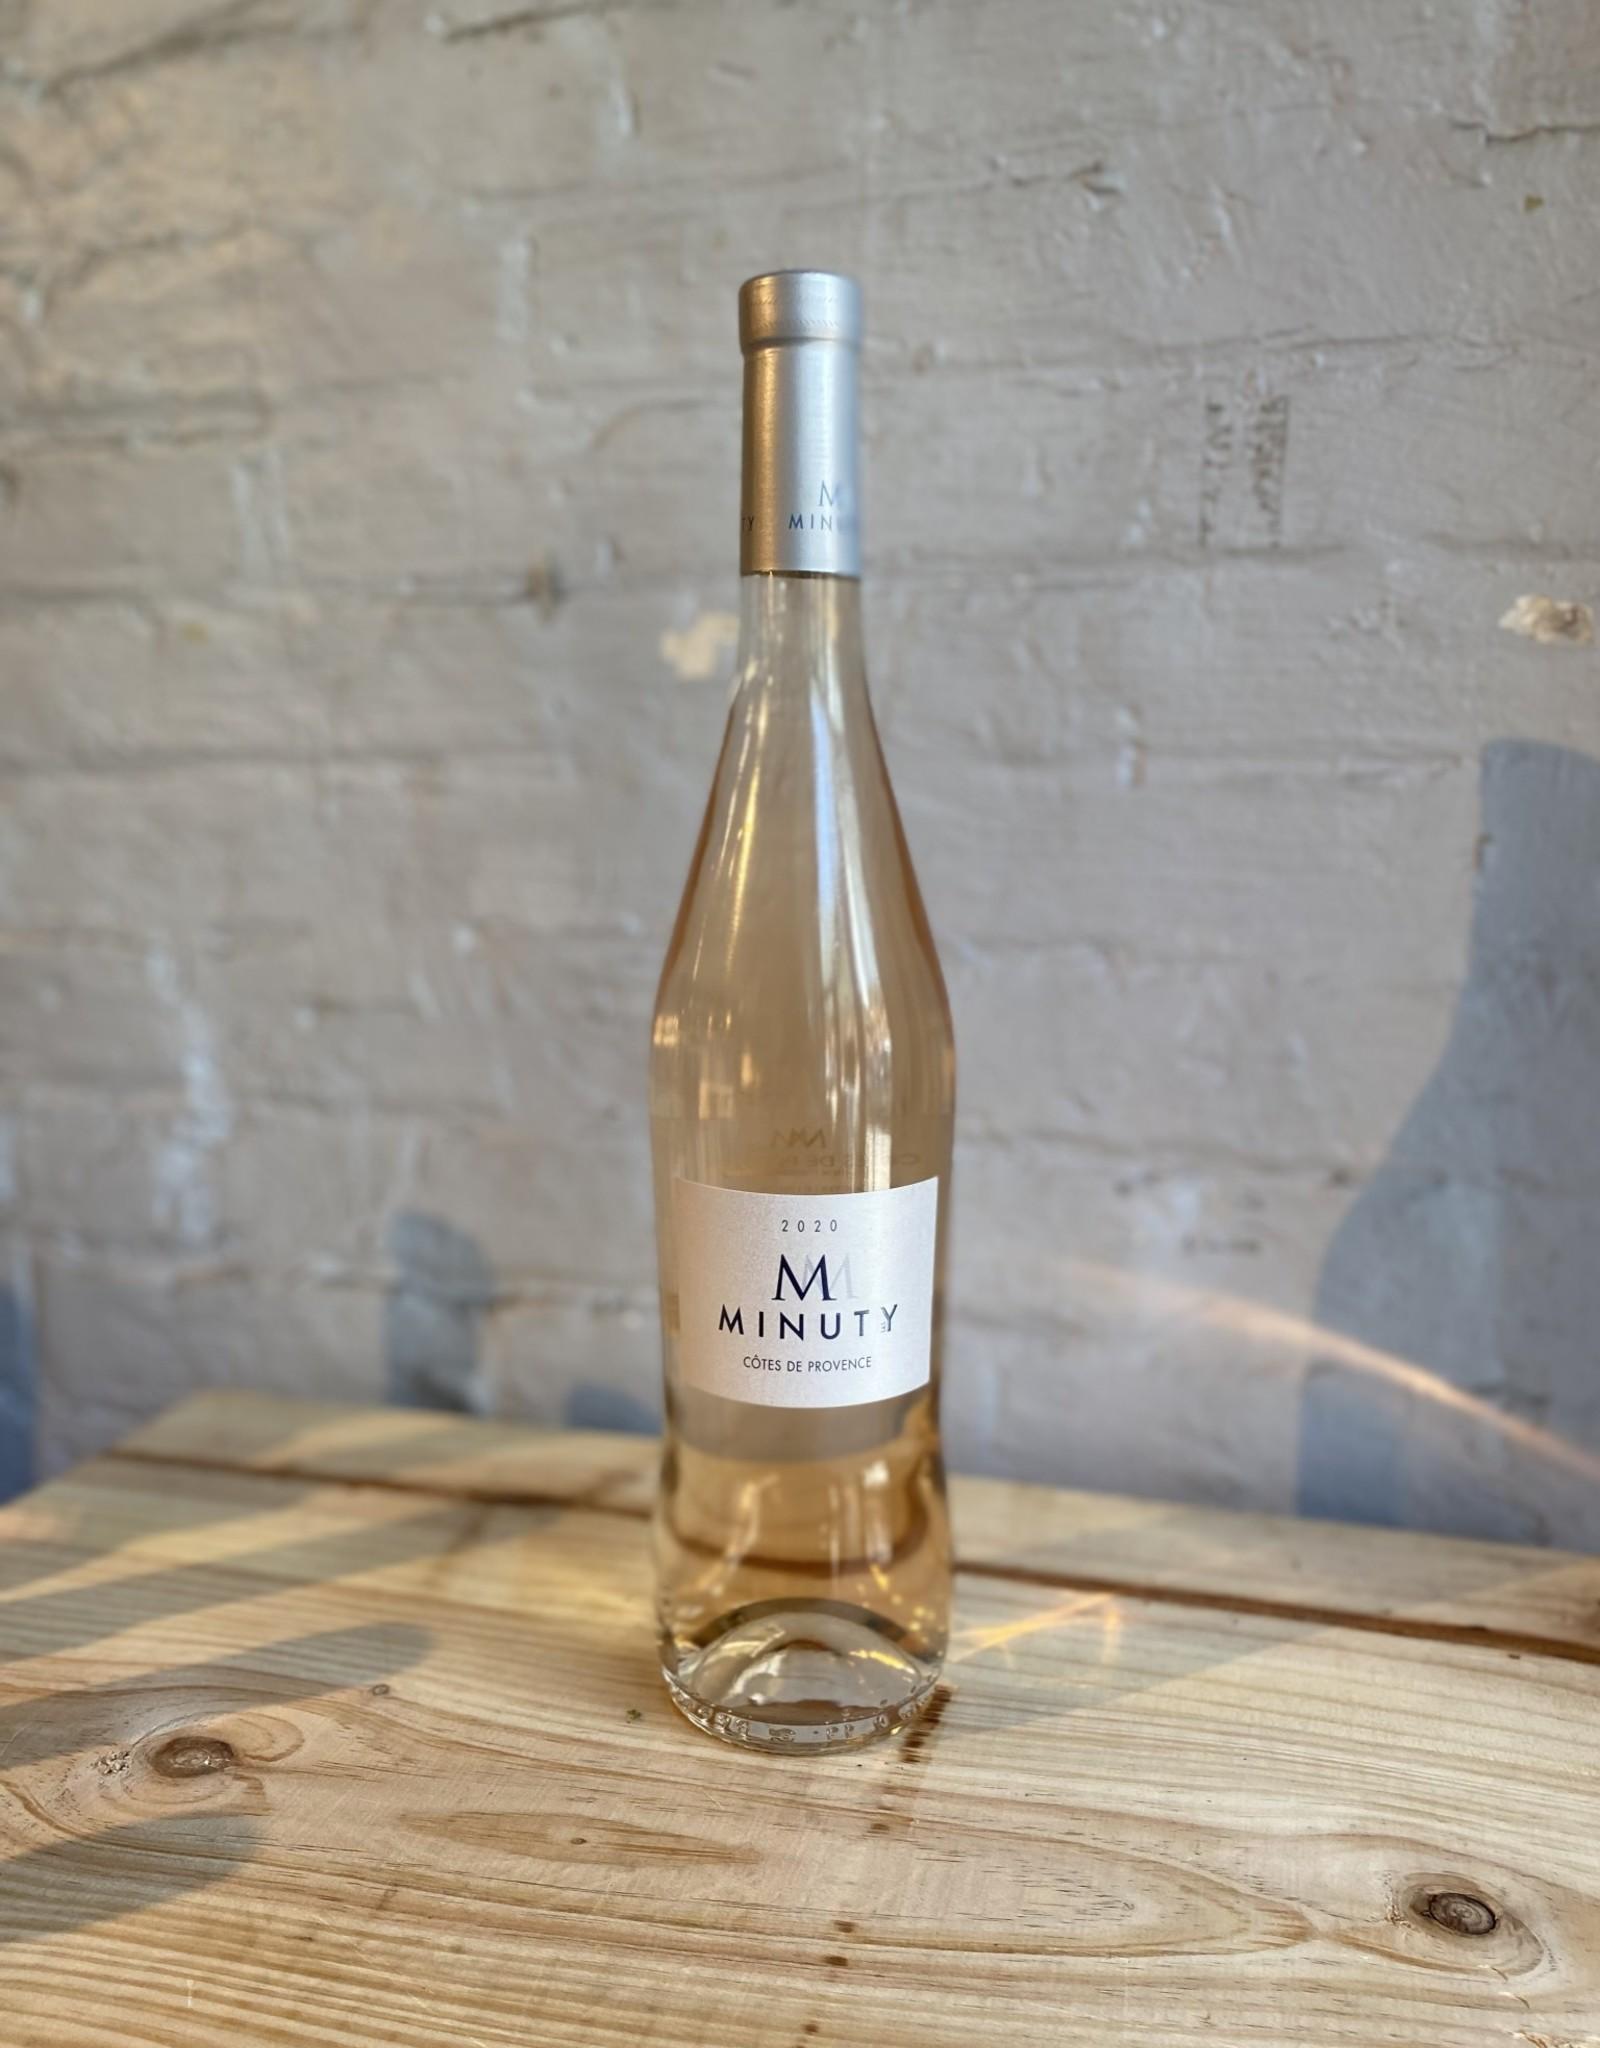 Wine 2020 Chateau Minuty M Rose - Cotes de Provence, France (750ml)